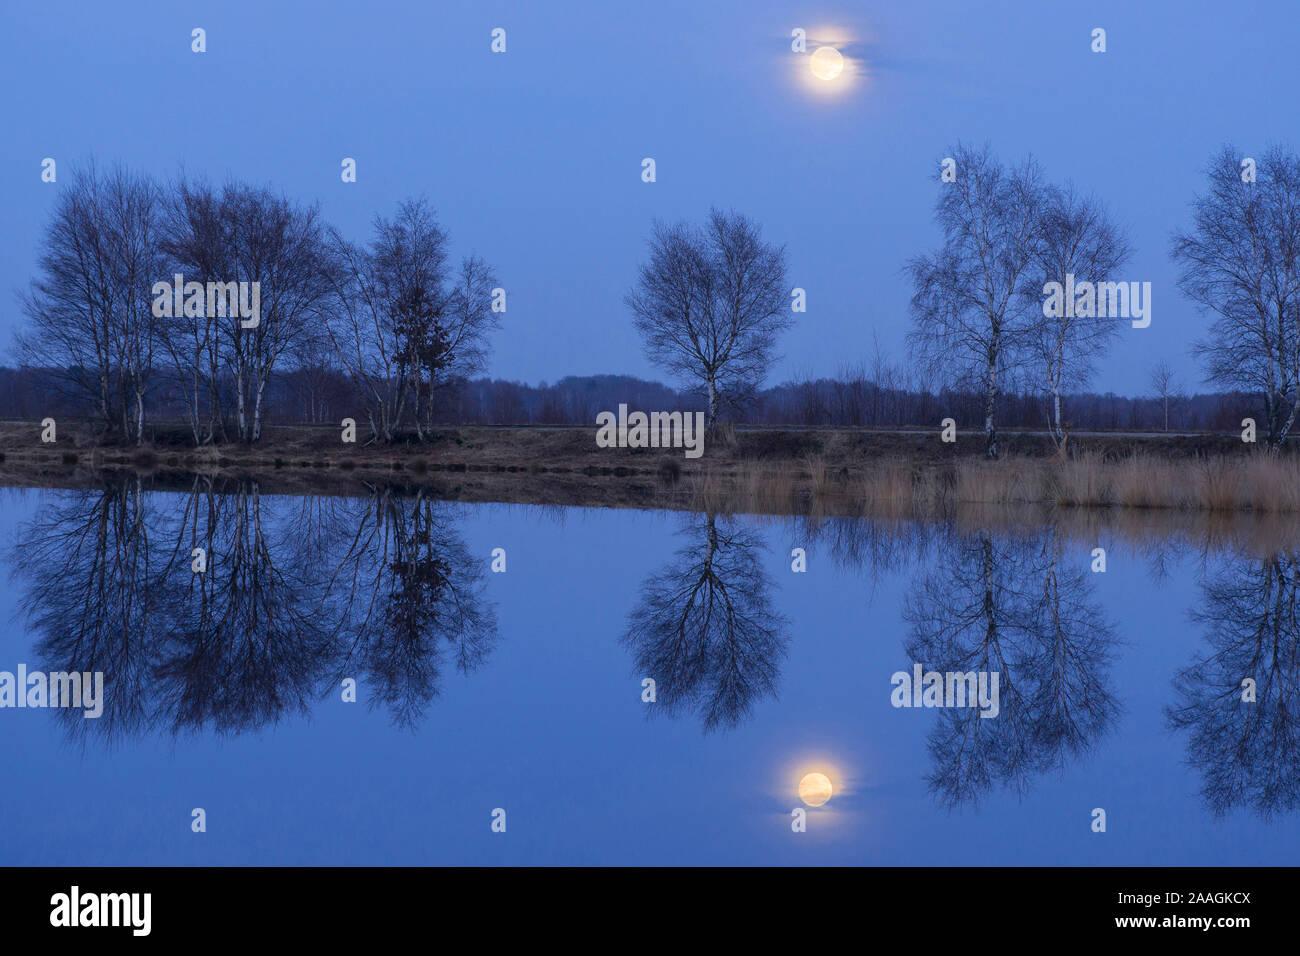 Mondaufgang im Moor Stock Photo